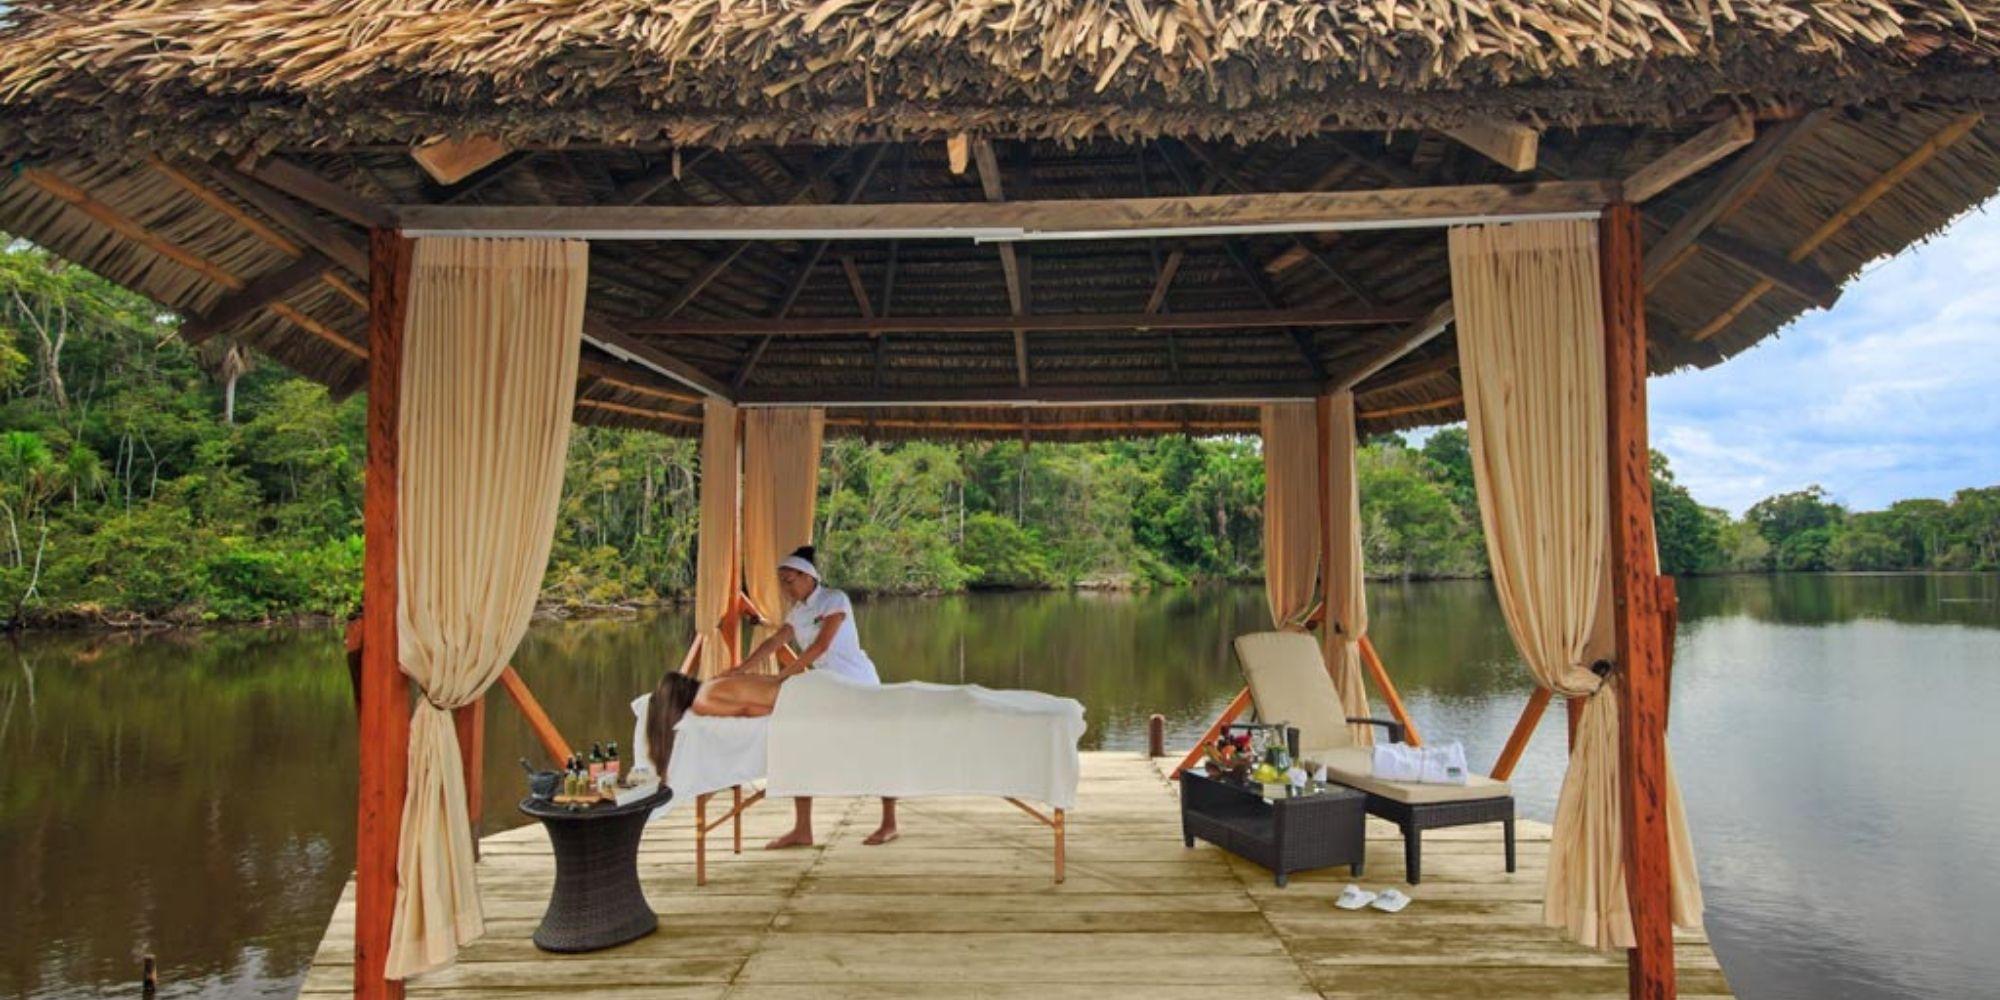 Getting a massage in the Amazon Jungle